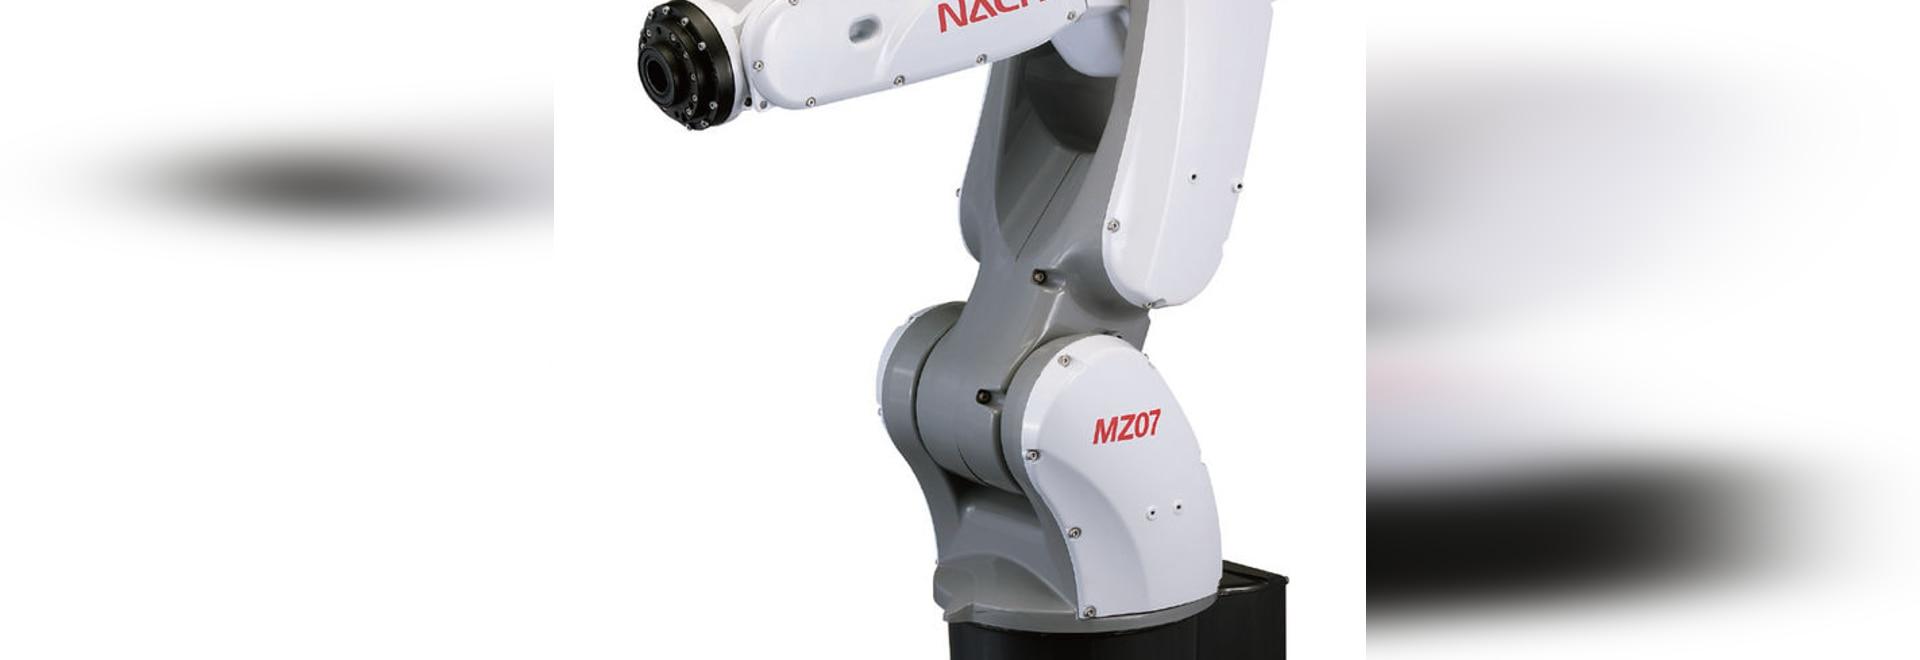 the World's Fastest Lightweight, Compact Robot - MZ07